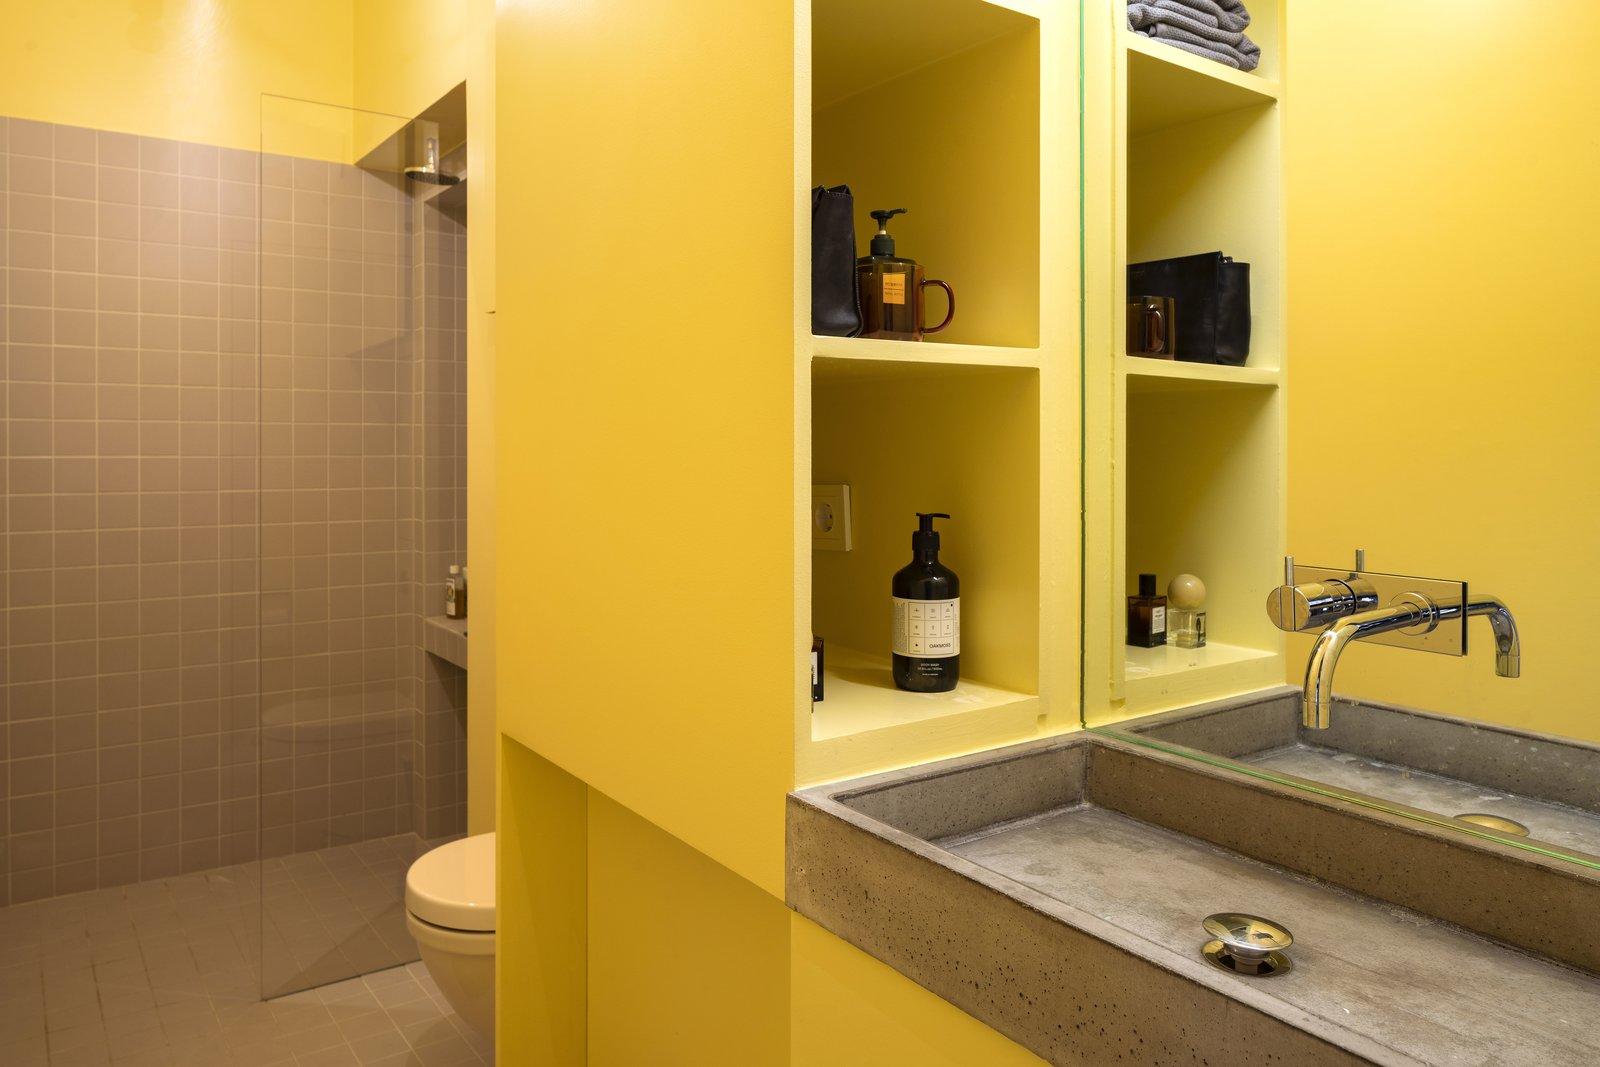 Function Wall bathroom storage